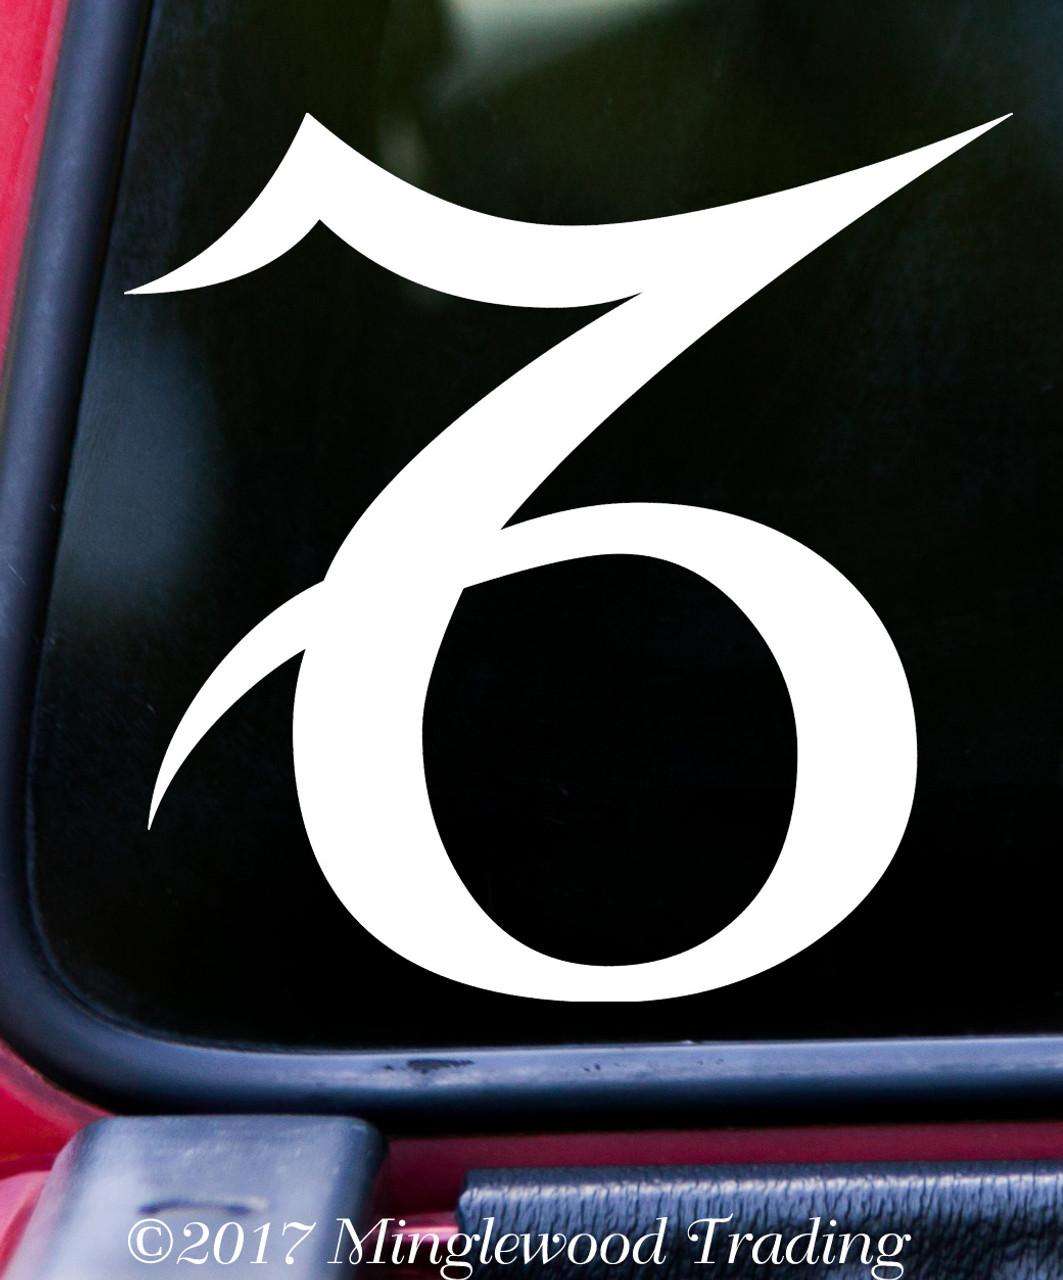 Capricorn Vinyl Decal - Astrology Zodiac Sign Earth The Sea-Goat - Die Cut Sticker